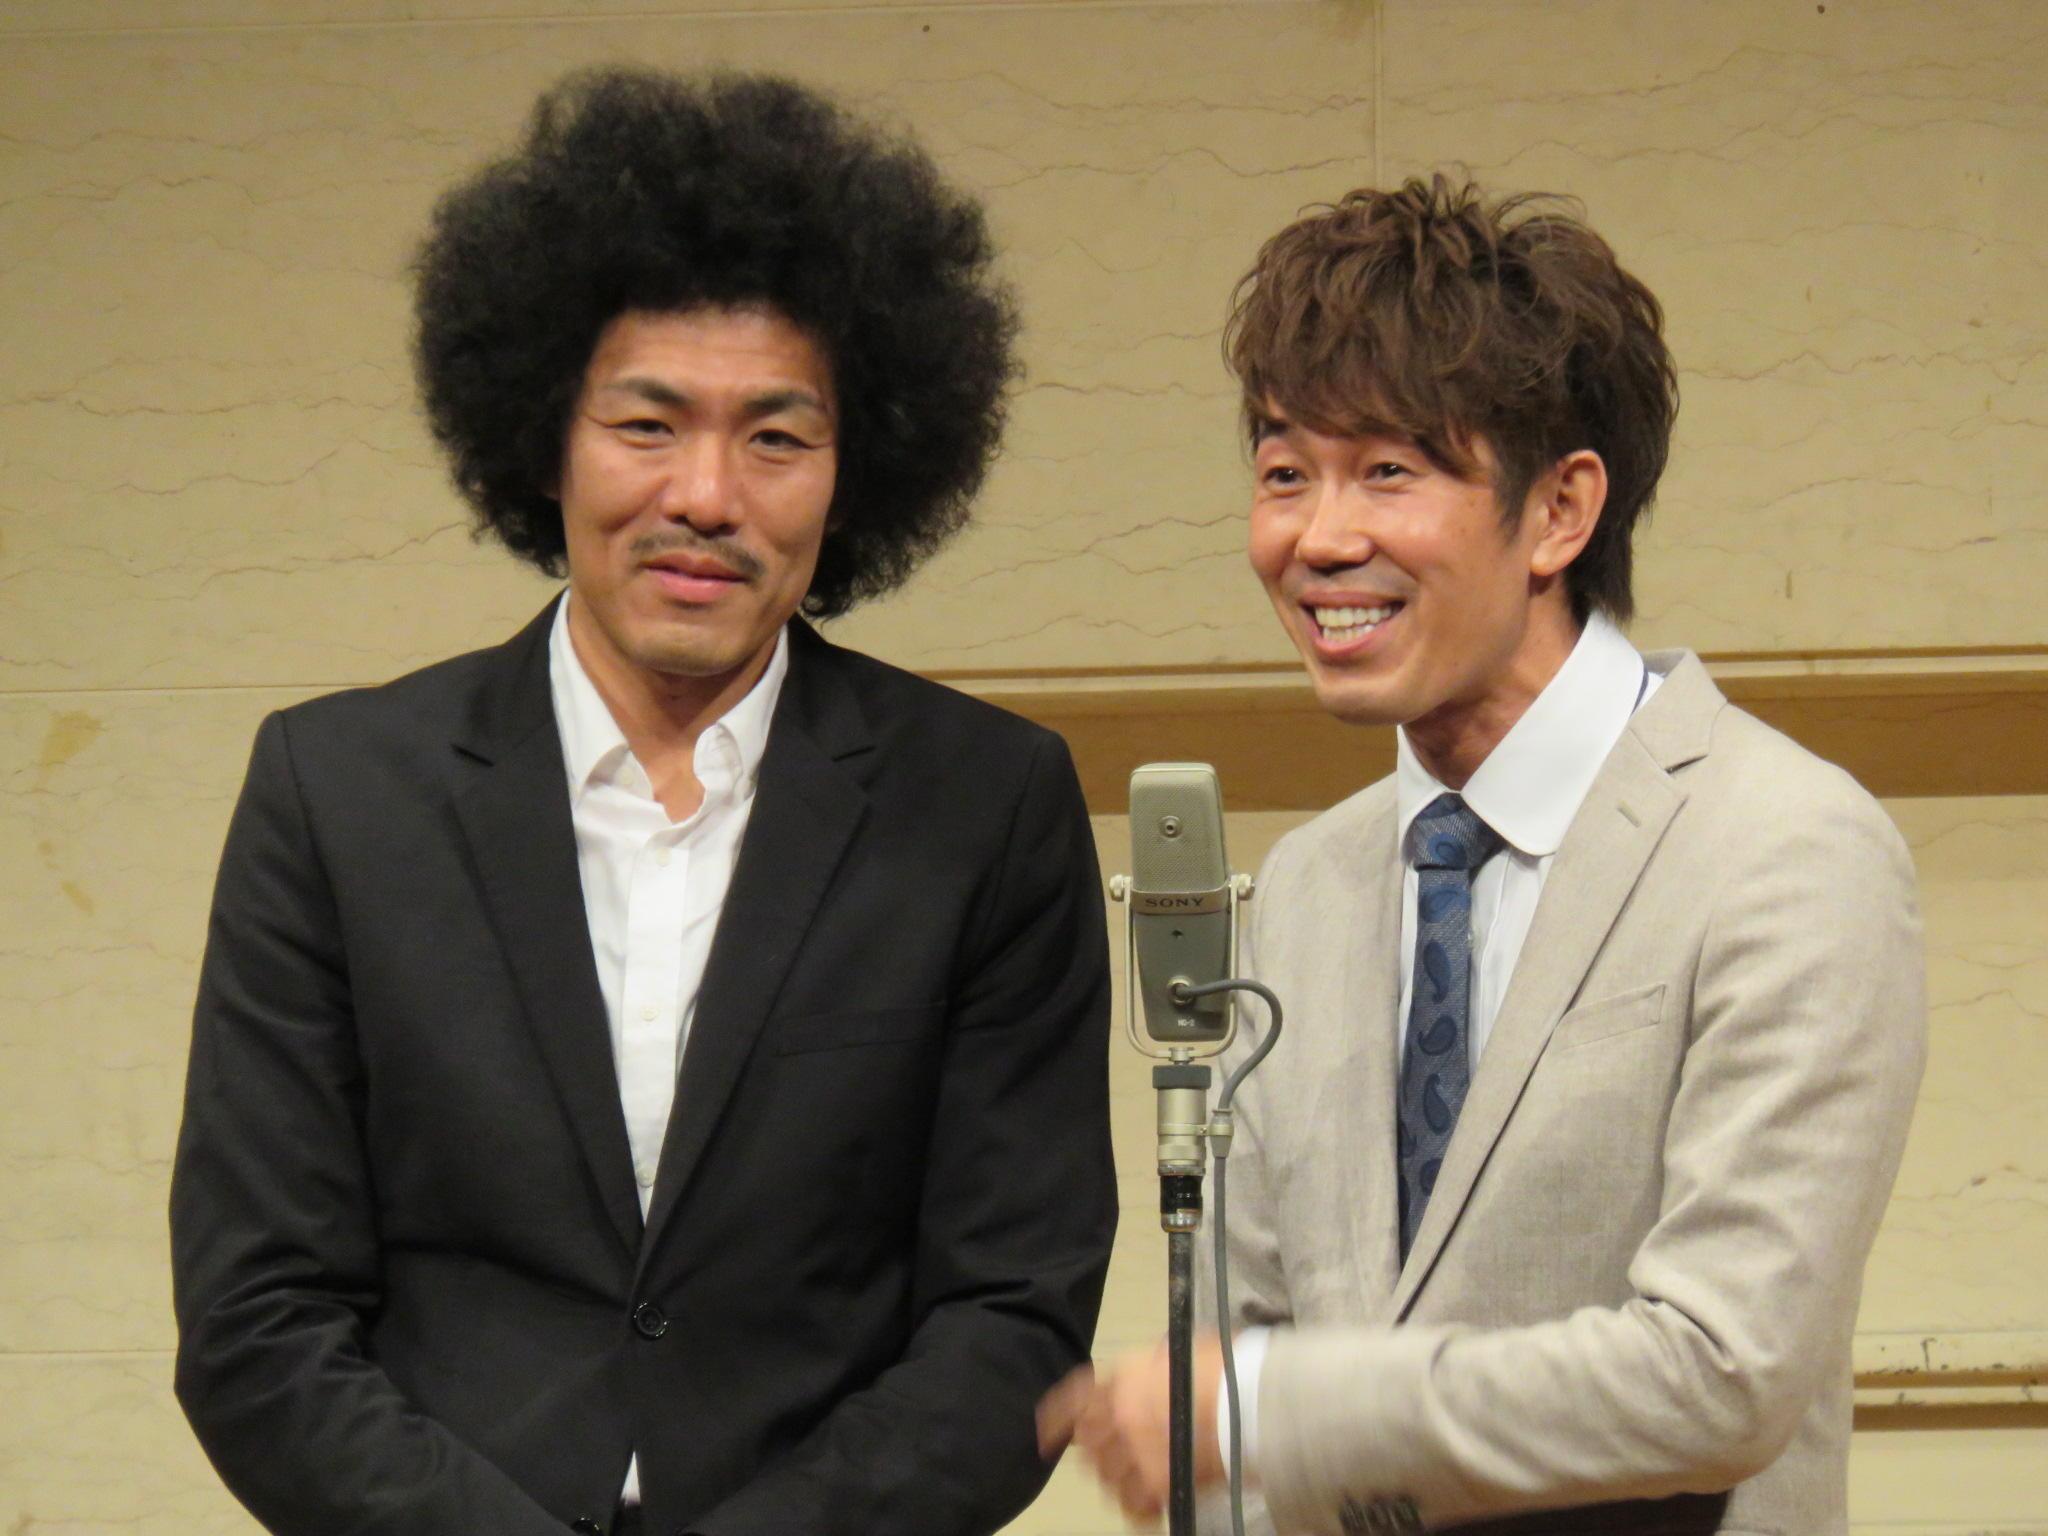 http://news.yoshimoto.co.jp/20170318143910-9fc2f311b5a019b89345902343a47e9926ccd443.jpg